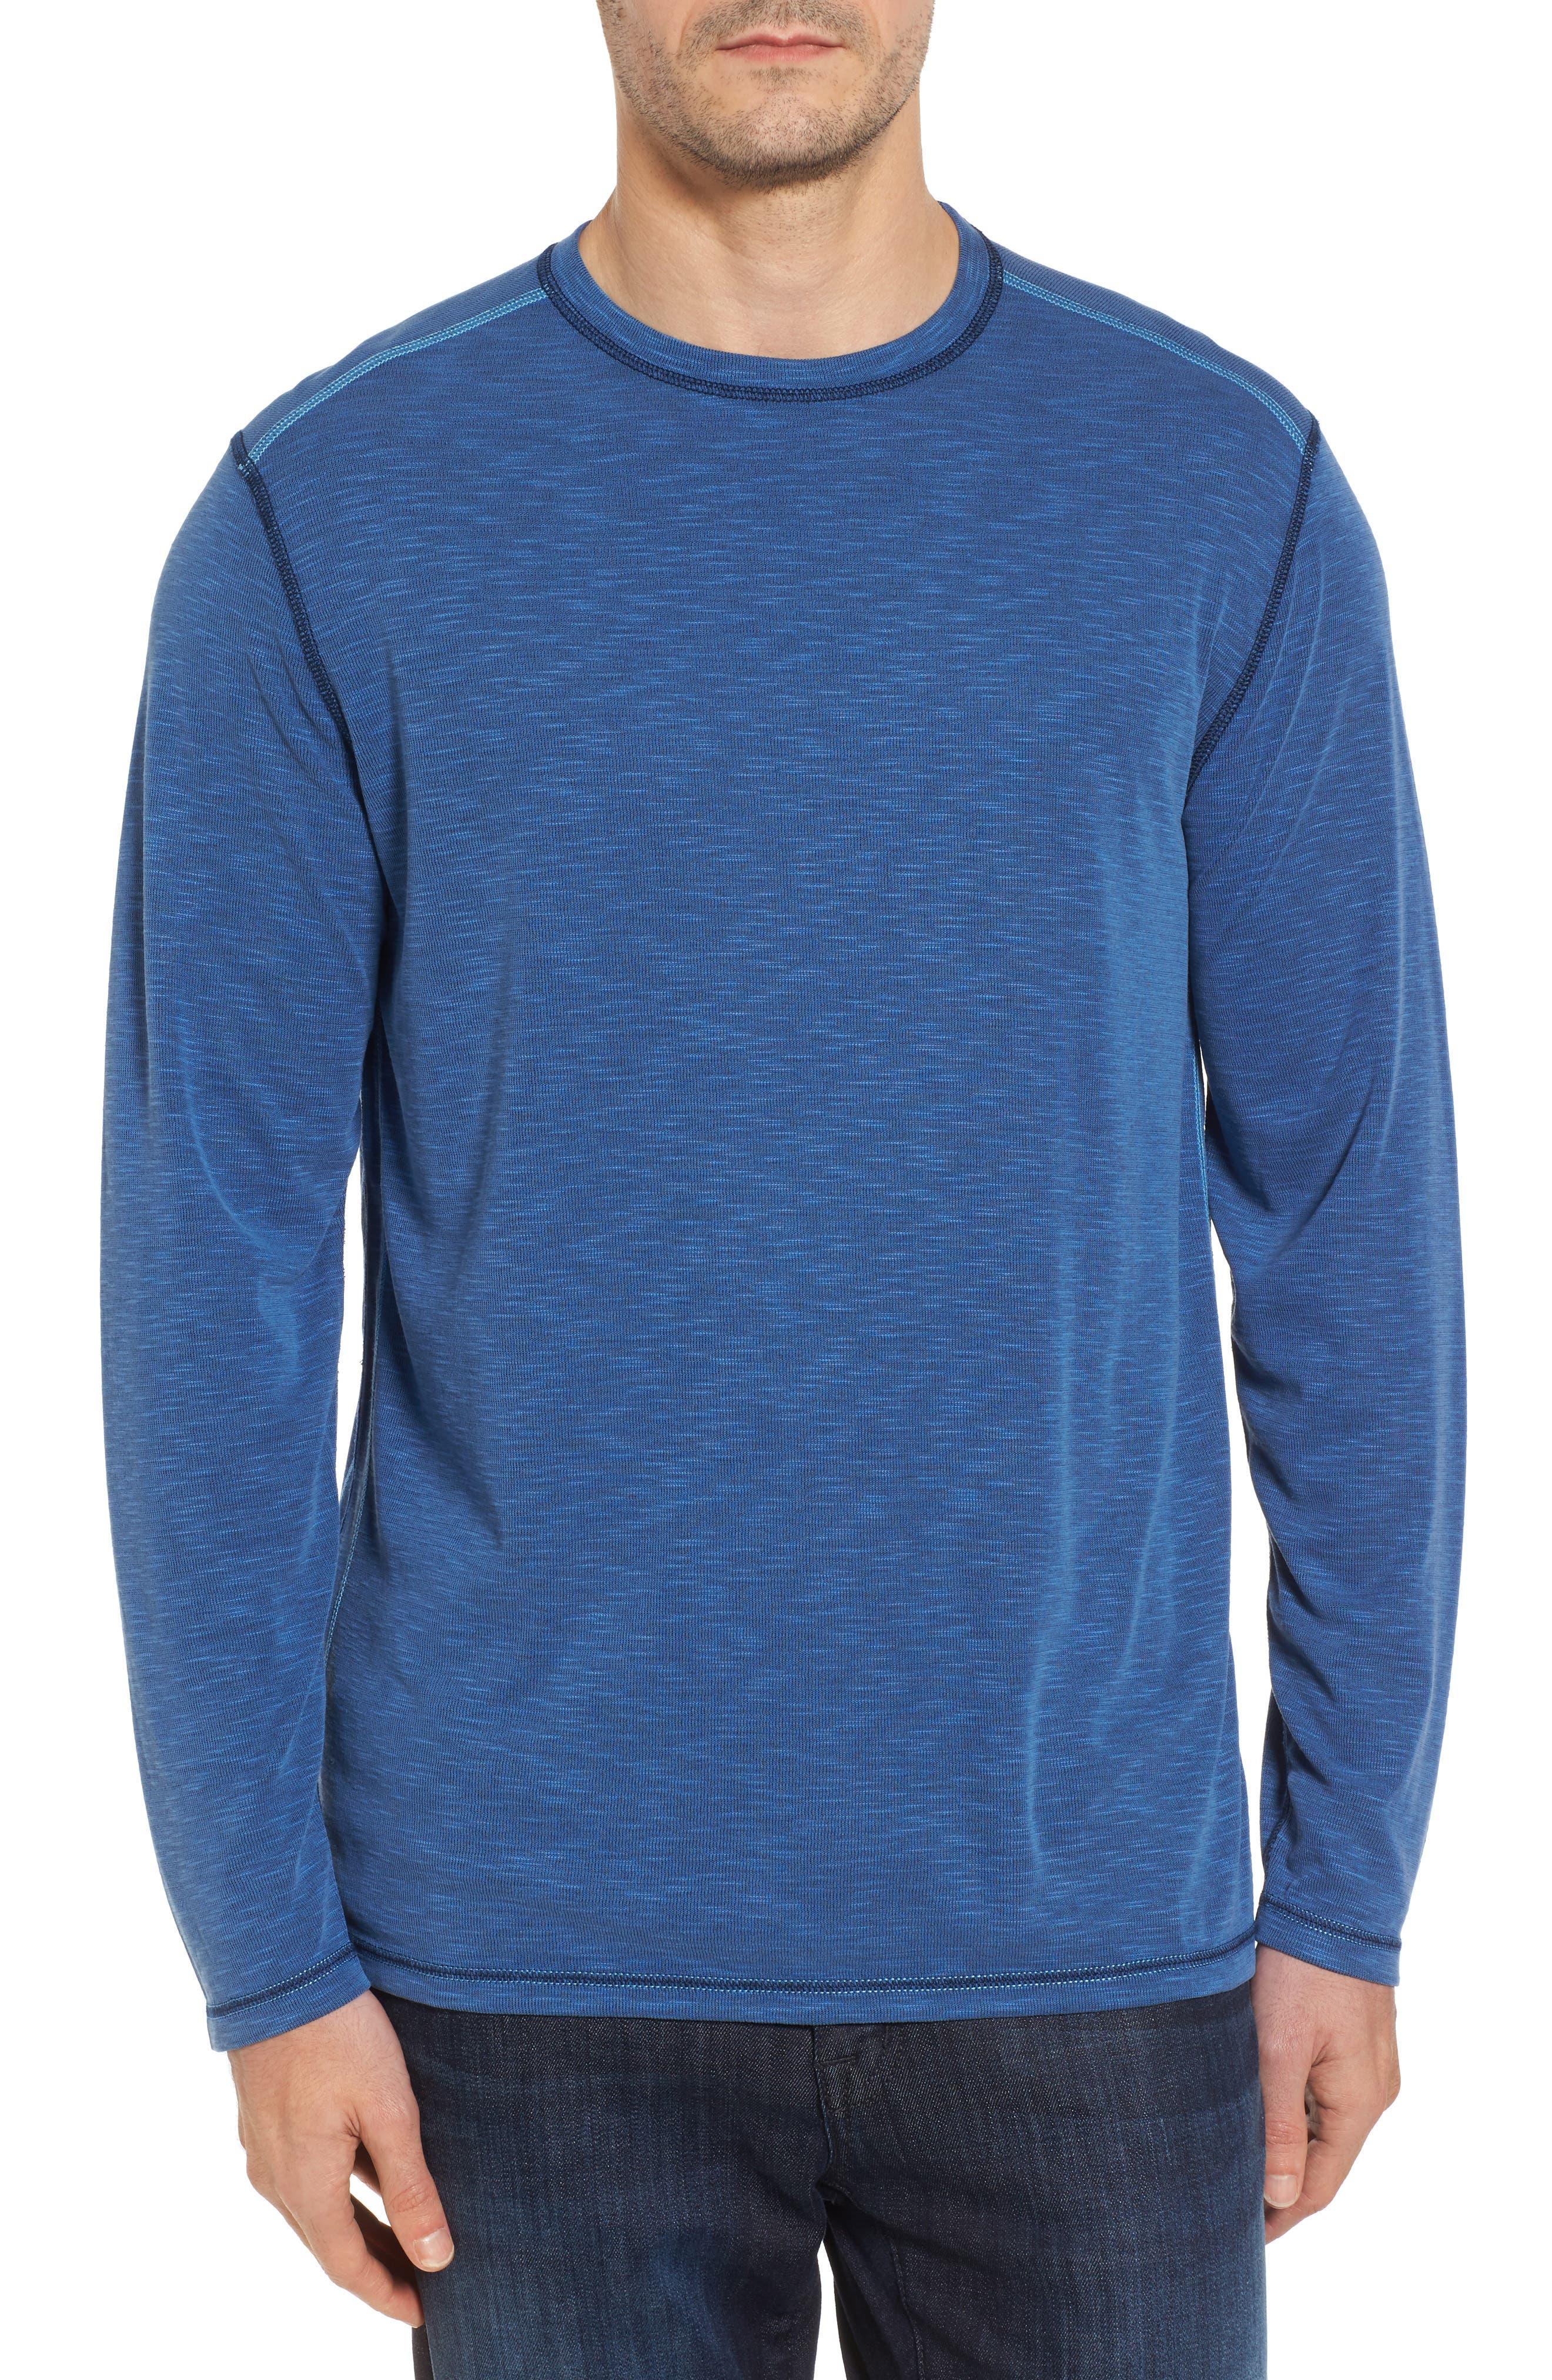 Image of Tommy Bahama Flip Tide Standard Fit Reversible T-Shirt